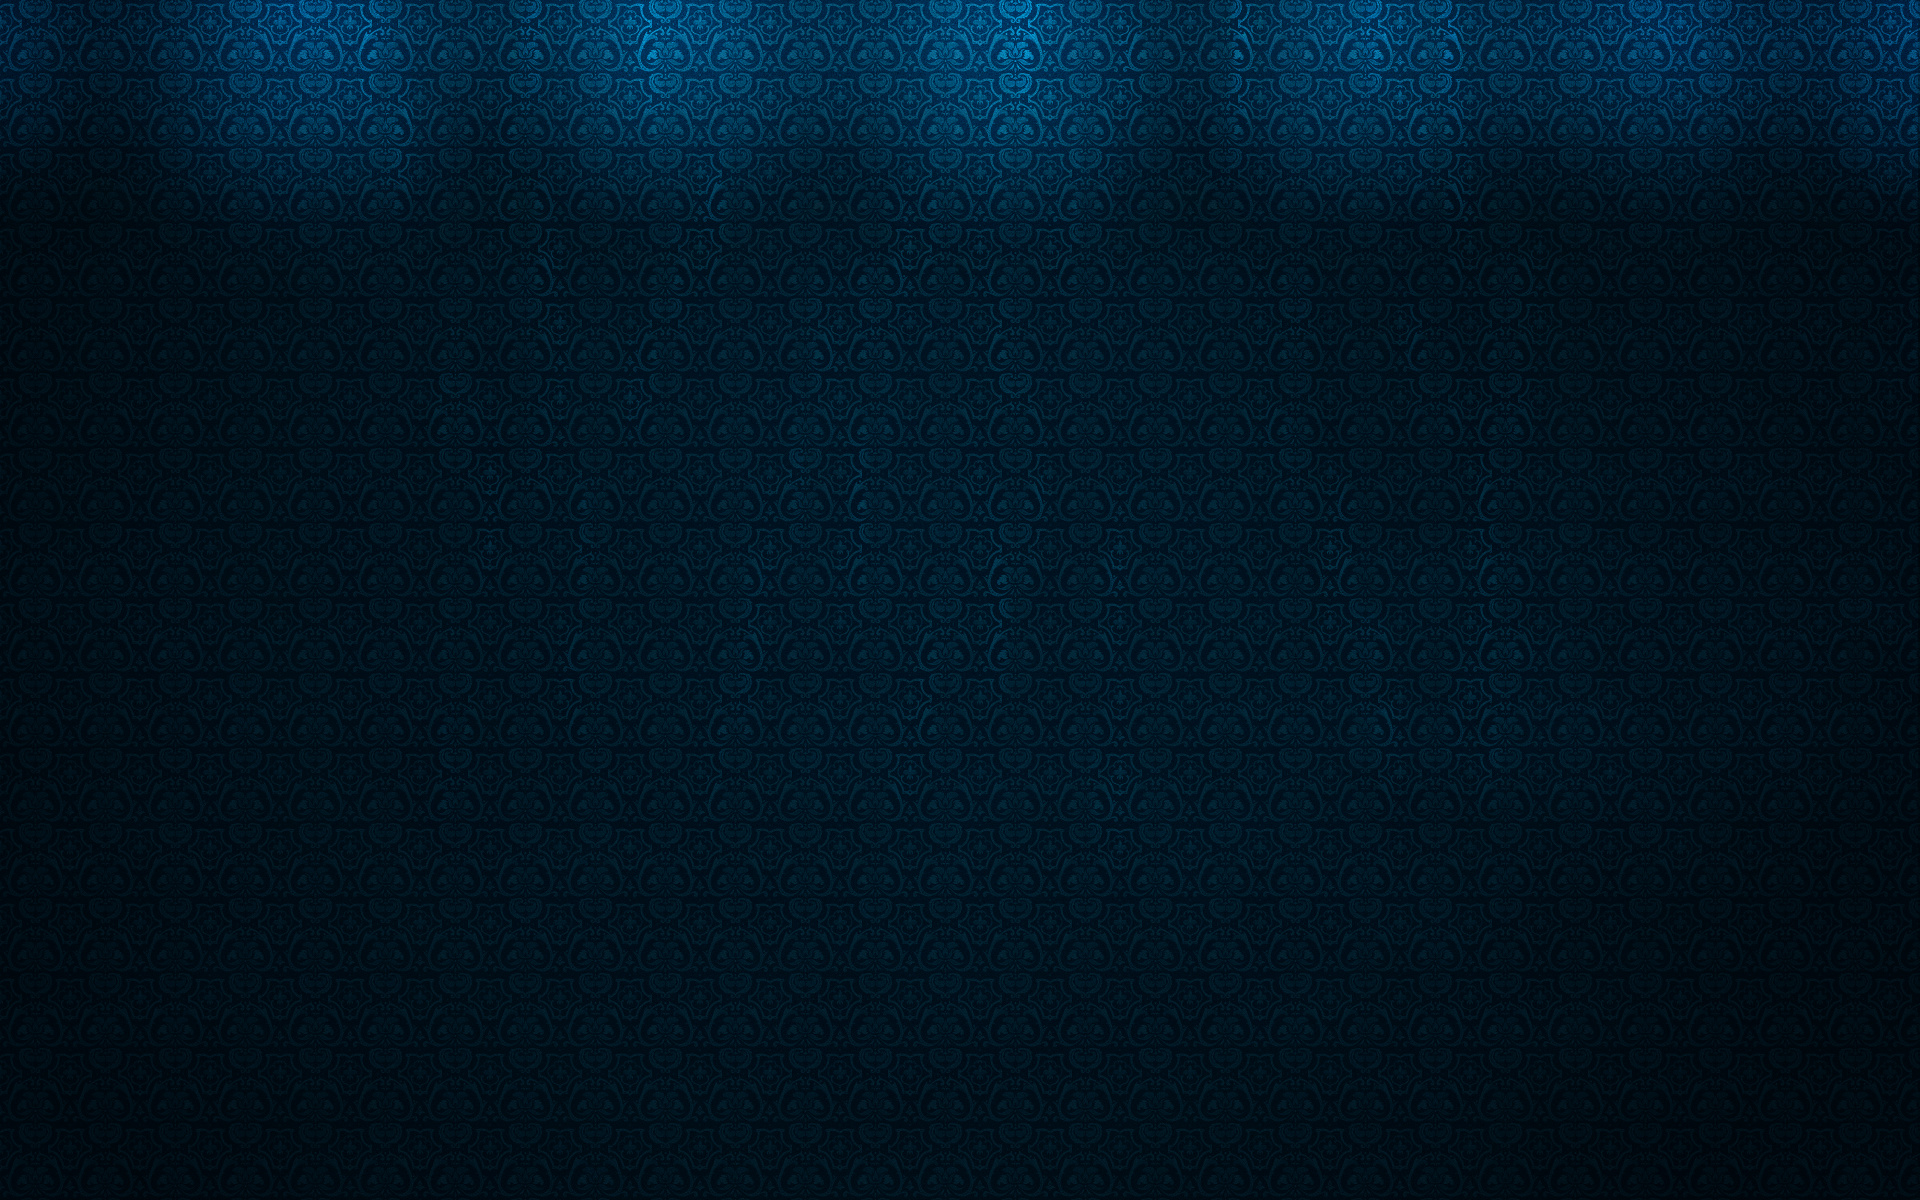 noir blue dark desktop wallpaper download noir blue dark wallpaper in 1920x1200